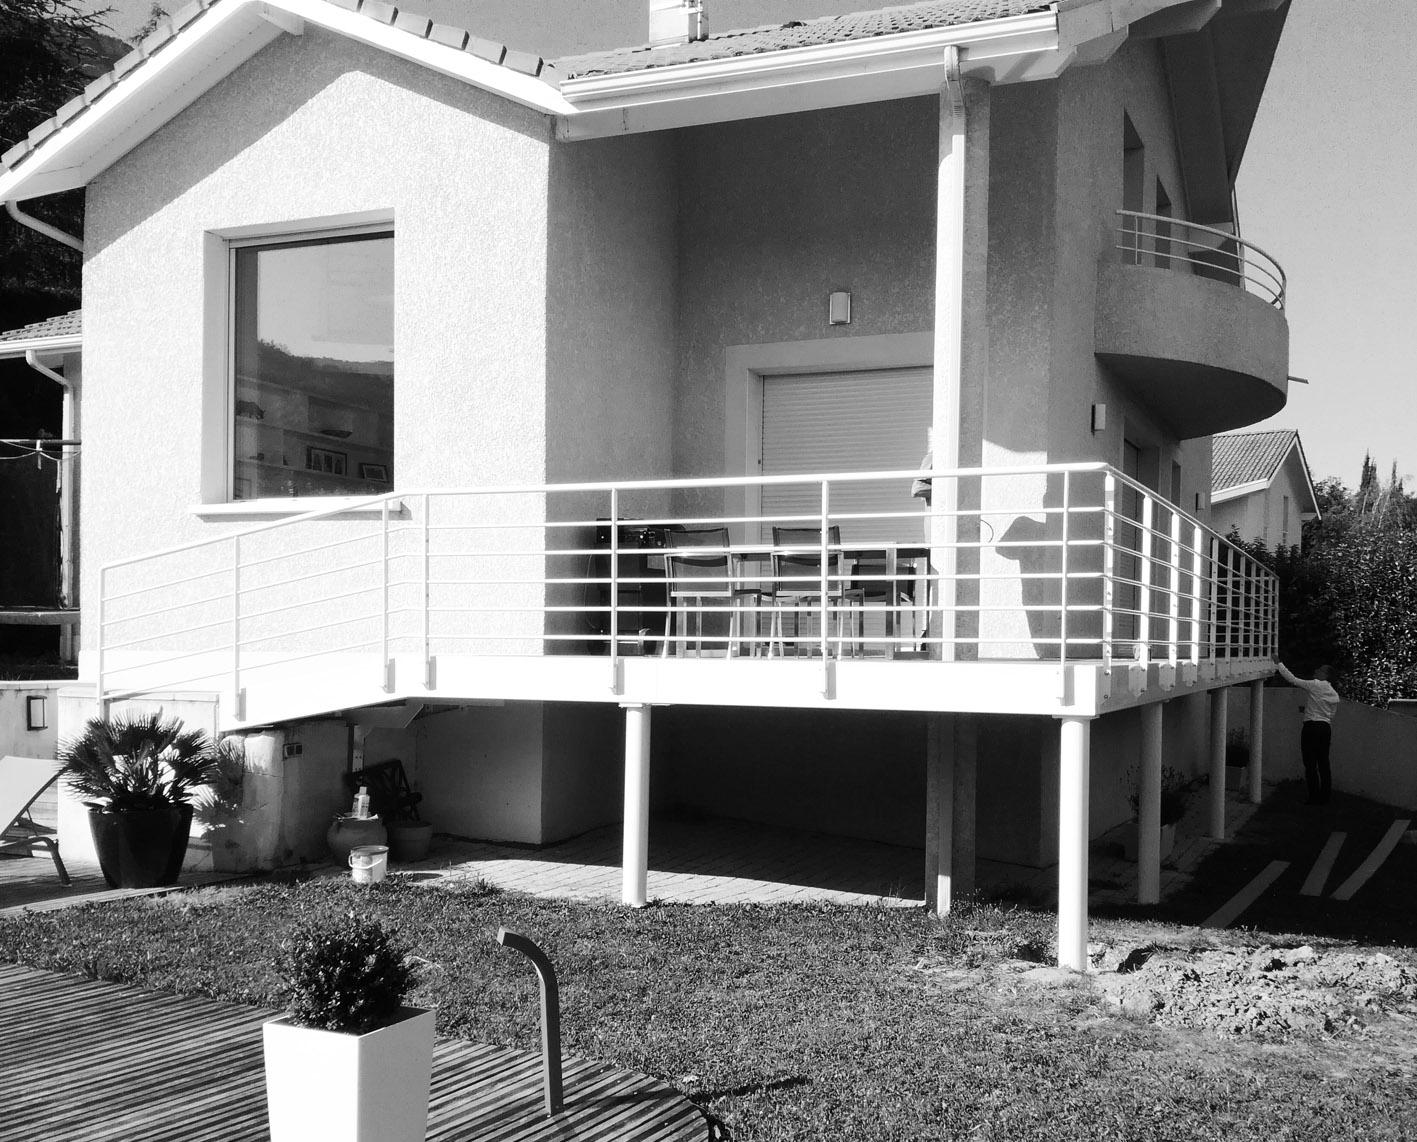 Terrasse et garde-corps